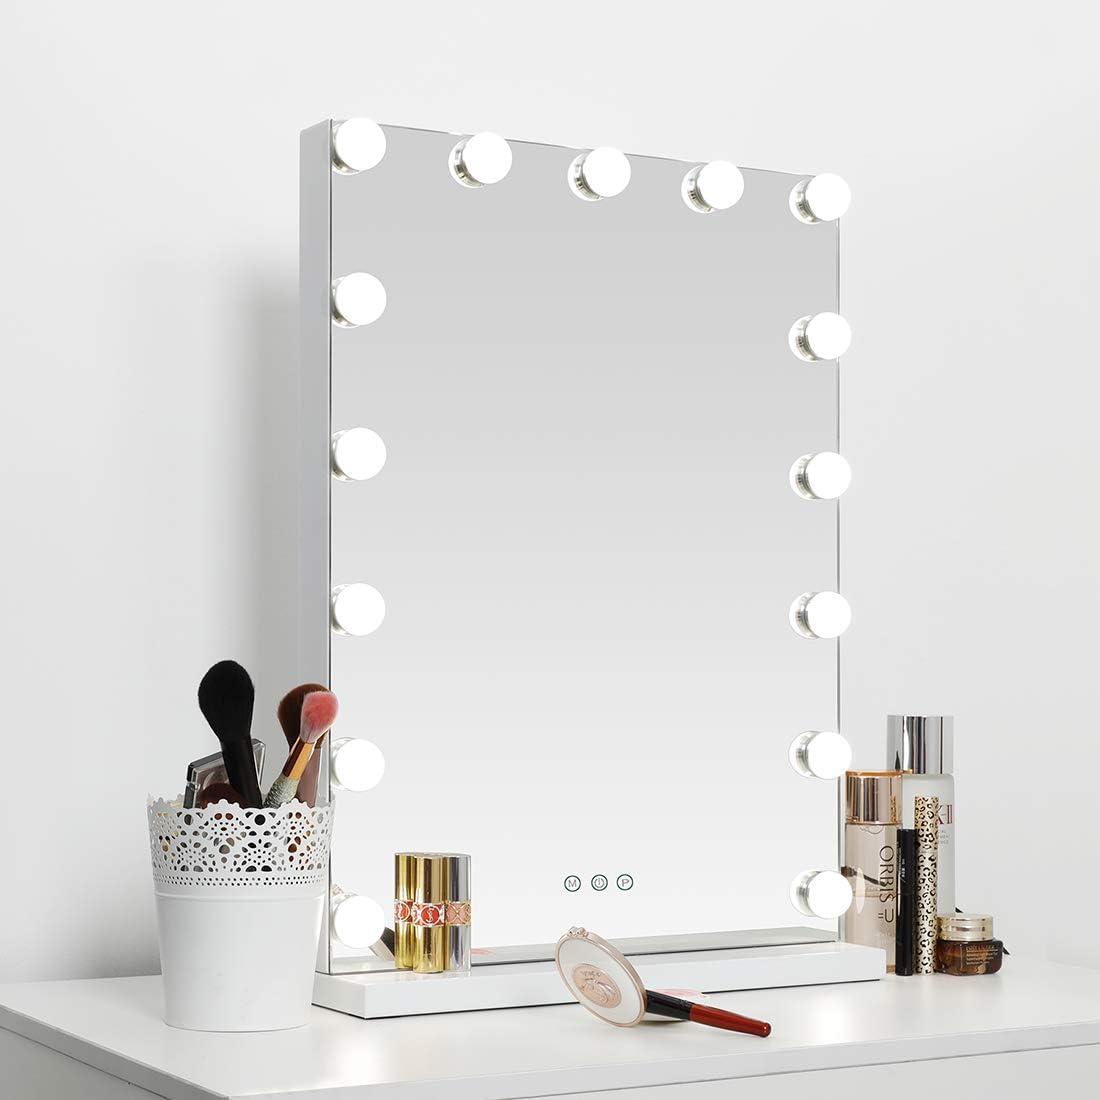 CHIM LED I Theater Bathroom Mirror Hollywood Mirror illuminated mirror made to measure